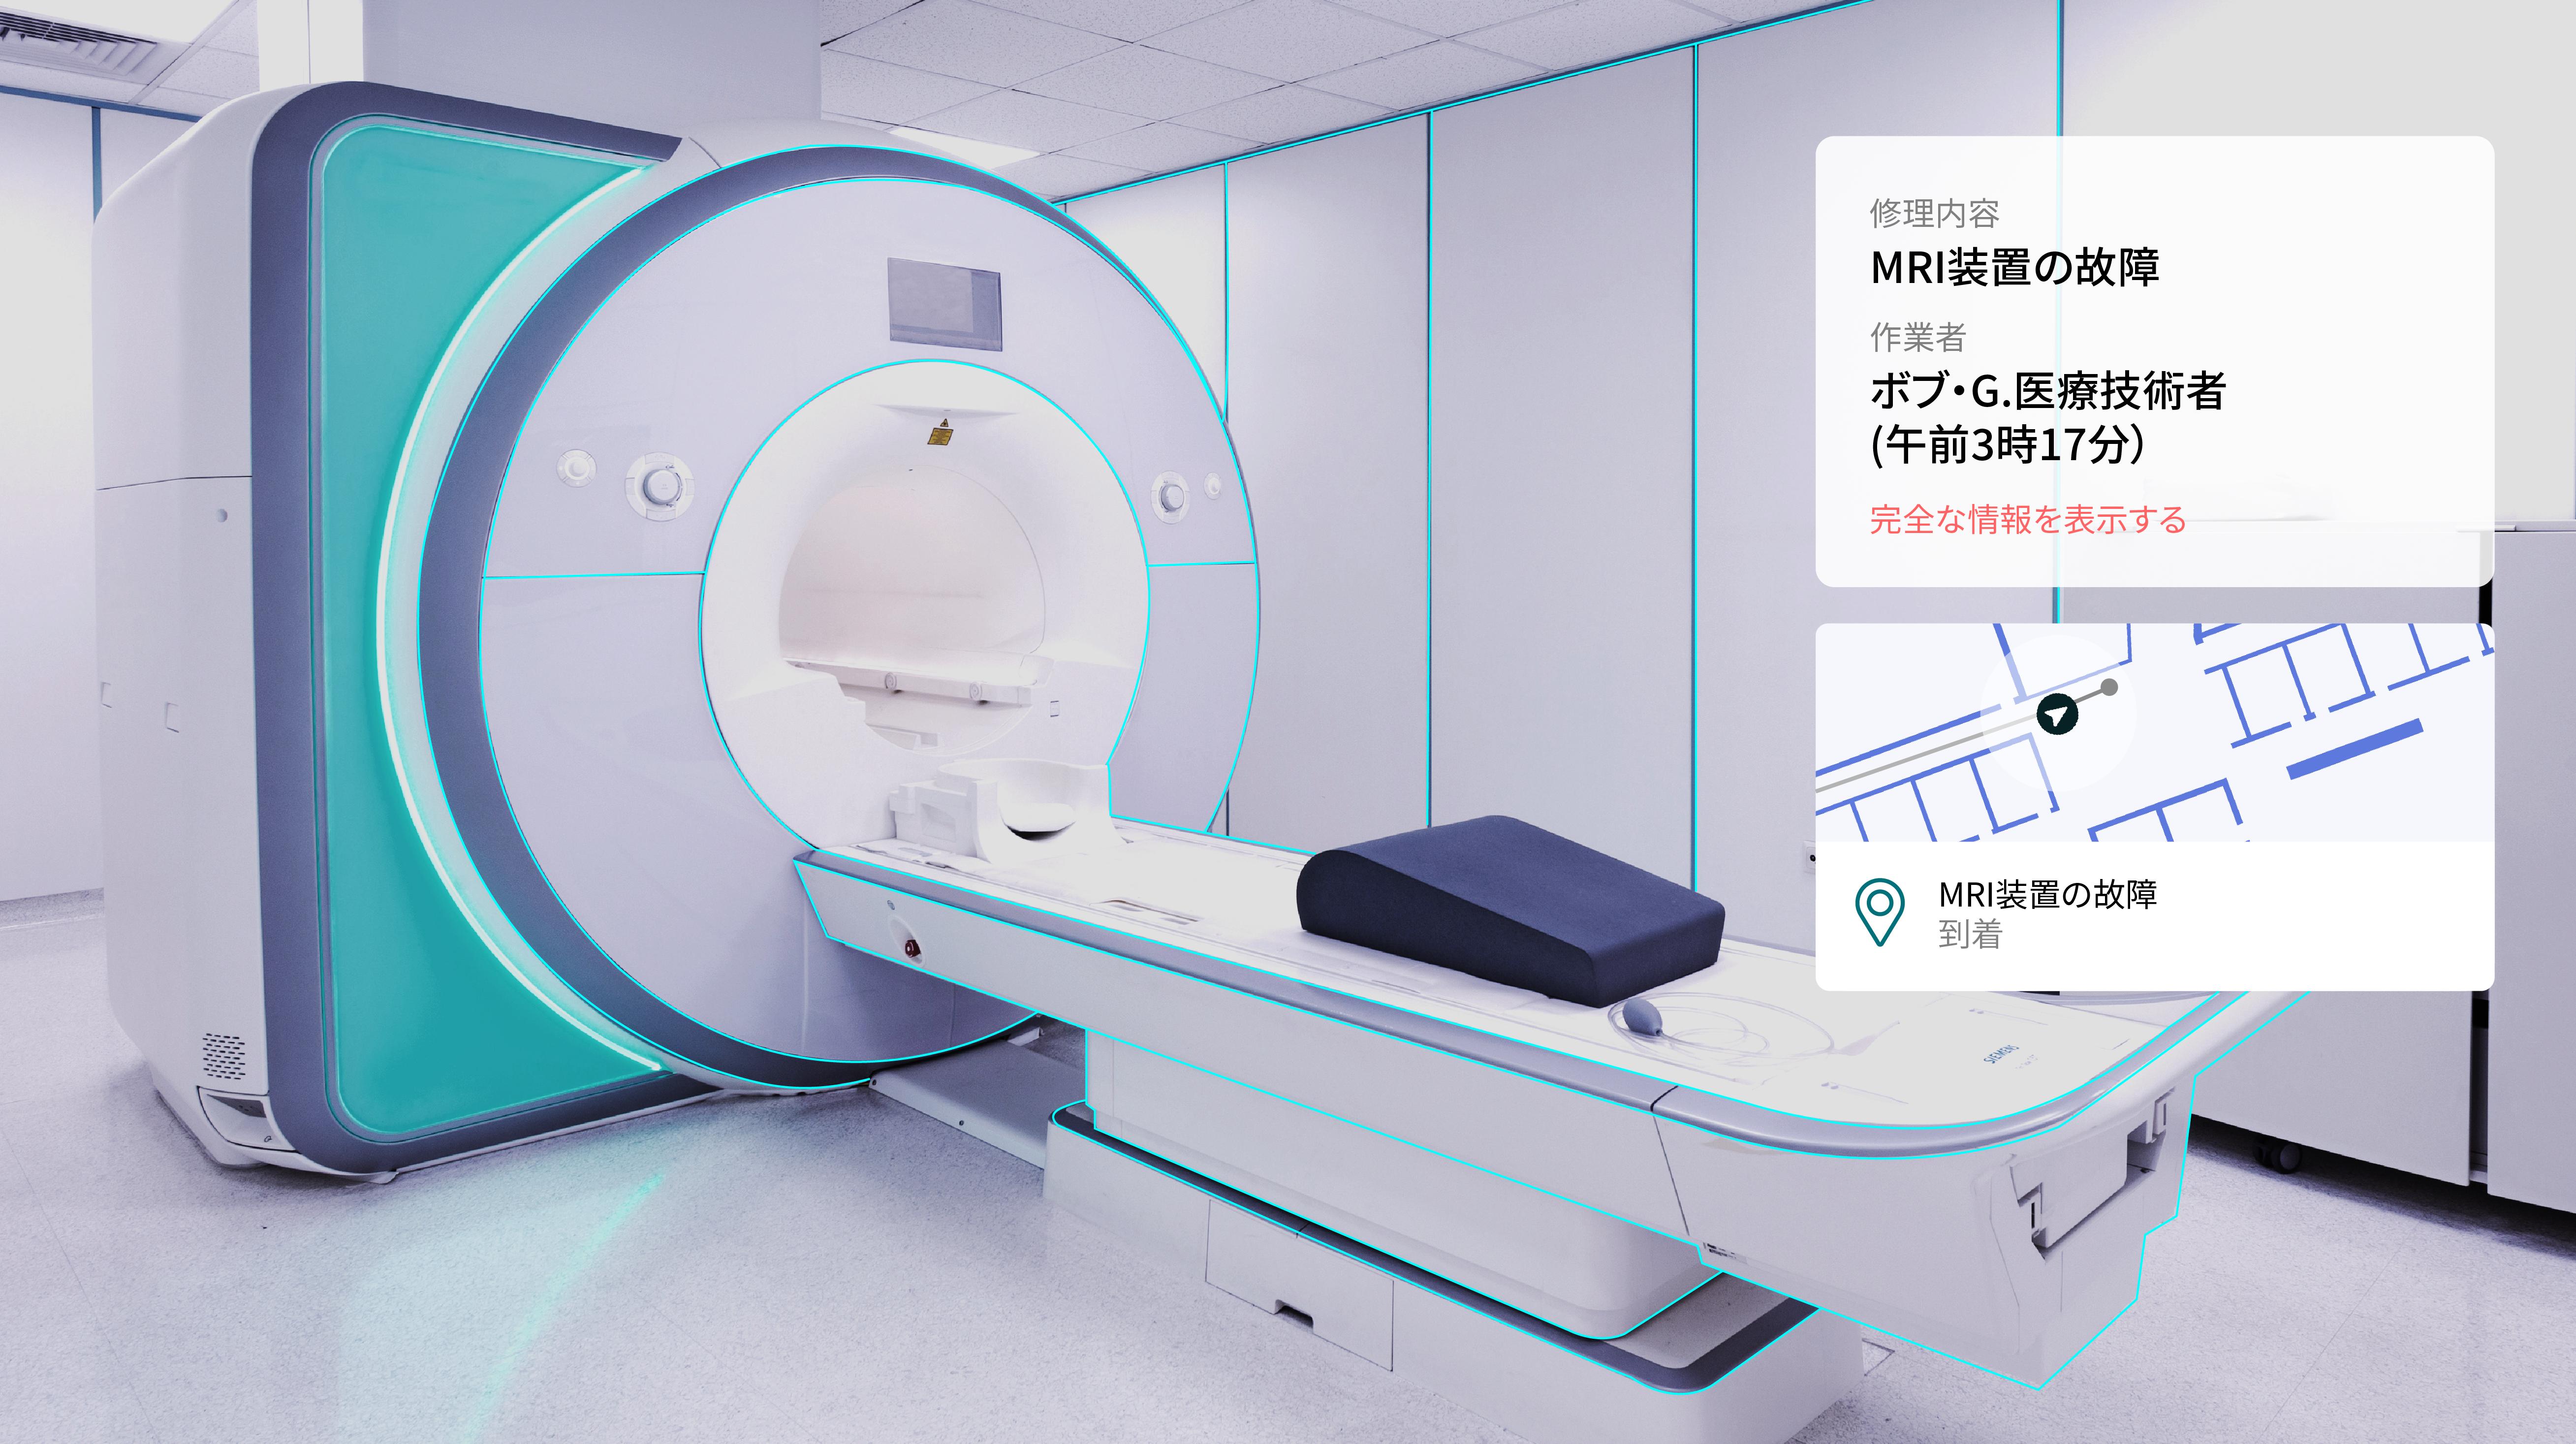 CTスキャン装置に関するチケットのオーバーレイ表示 - 「修理内容:MRI装置の故障。作業者:ボブ・G.医療技術者(午前3時17分)。リンク:完全な情報を表示する」と表示。